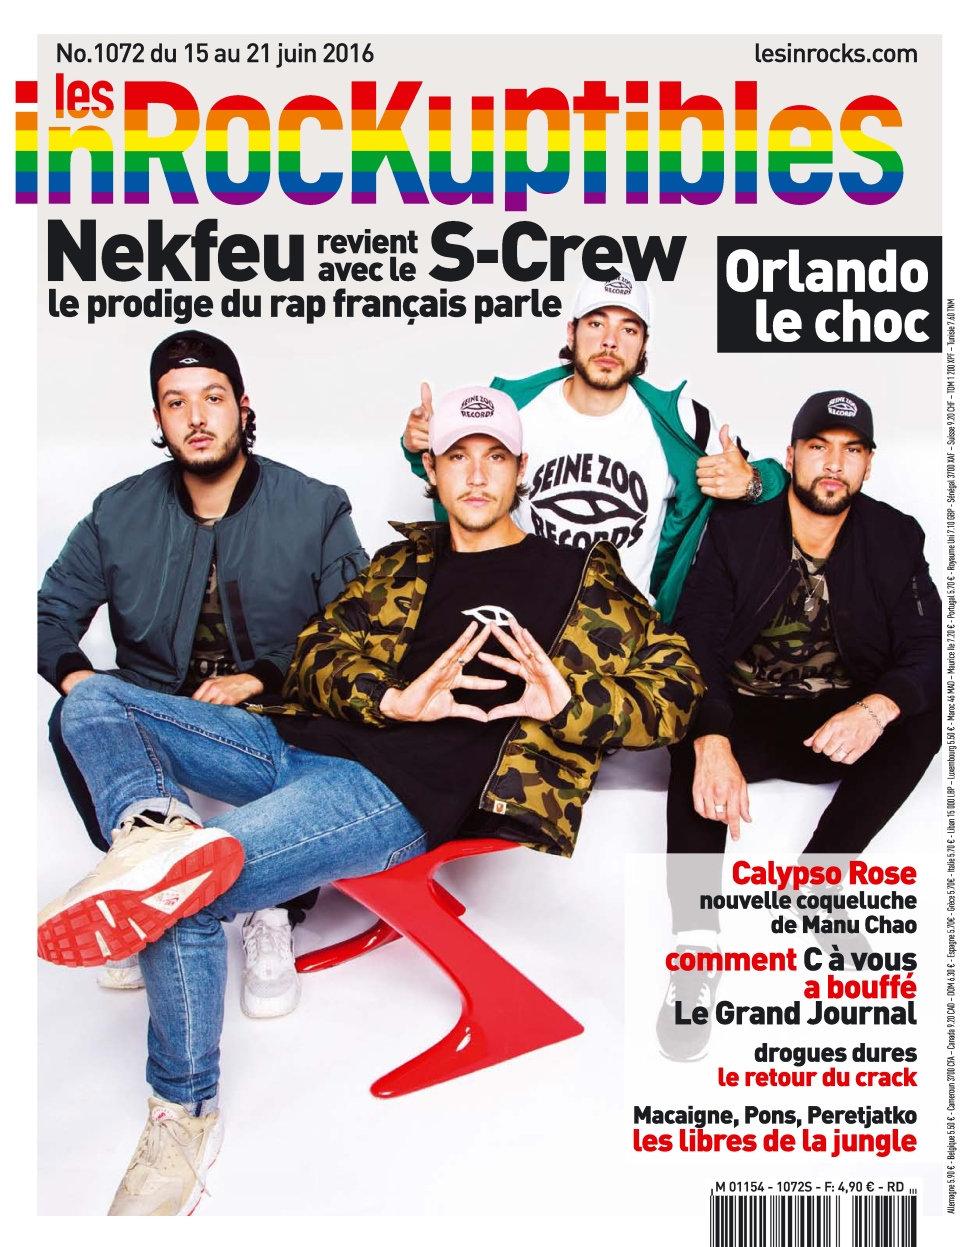 Les Inrockuptibles N°1072 - 15 au 21 Juin 2016